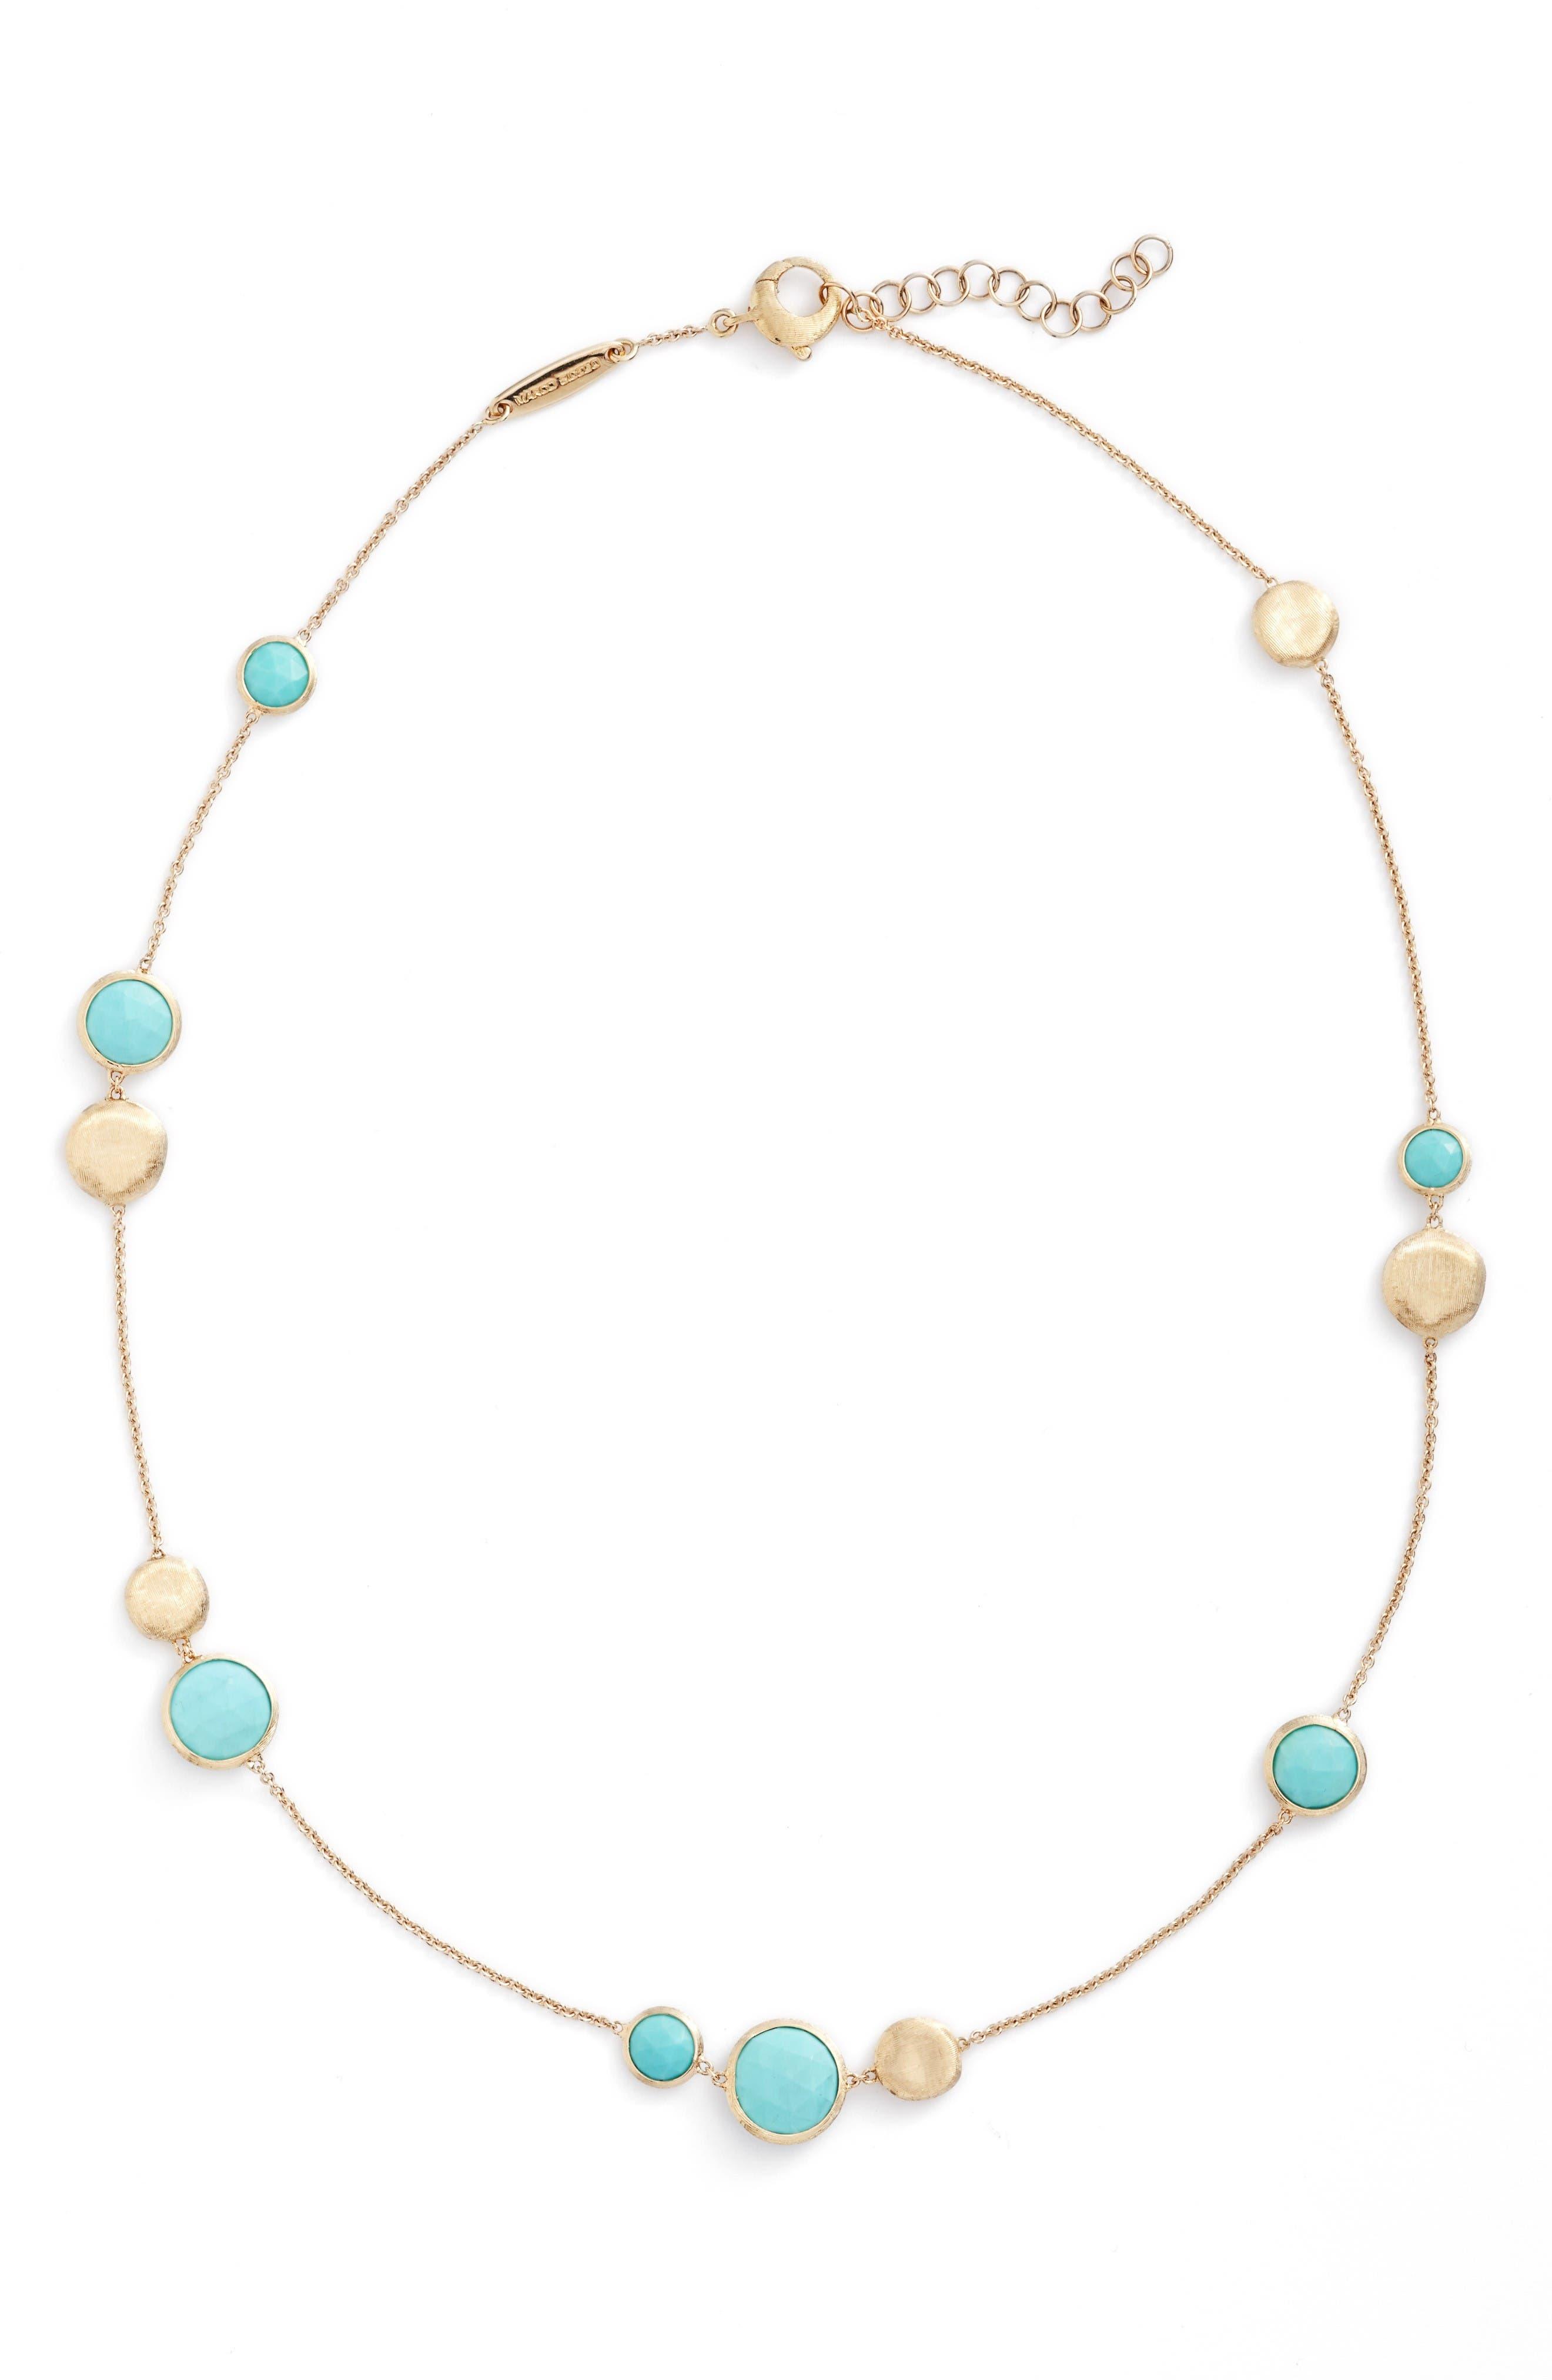 Main Image - Marco Bicego Jaipur Stone Collar Necklace